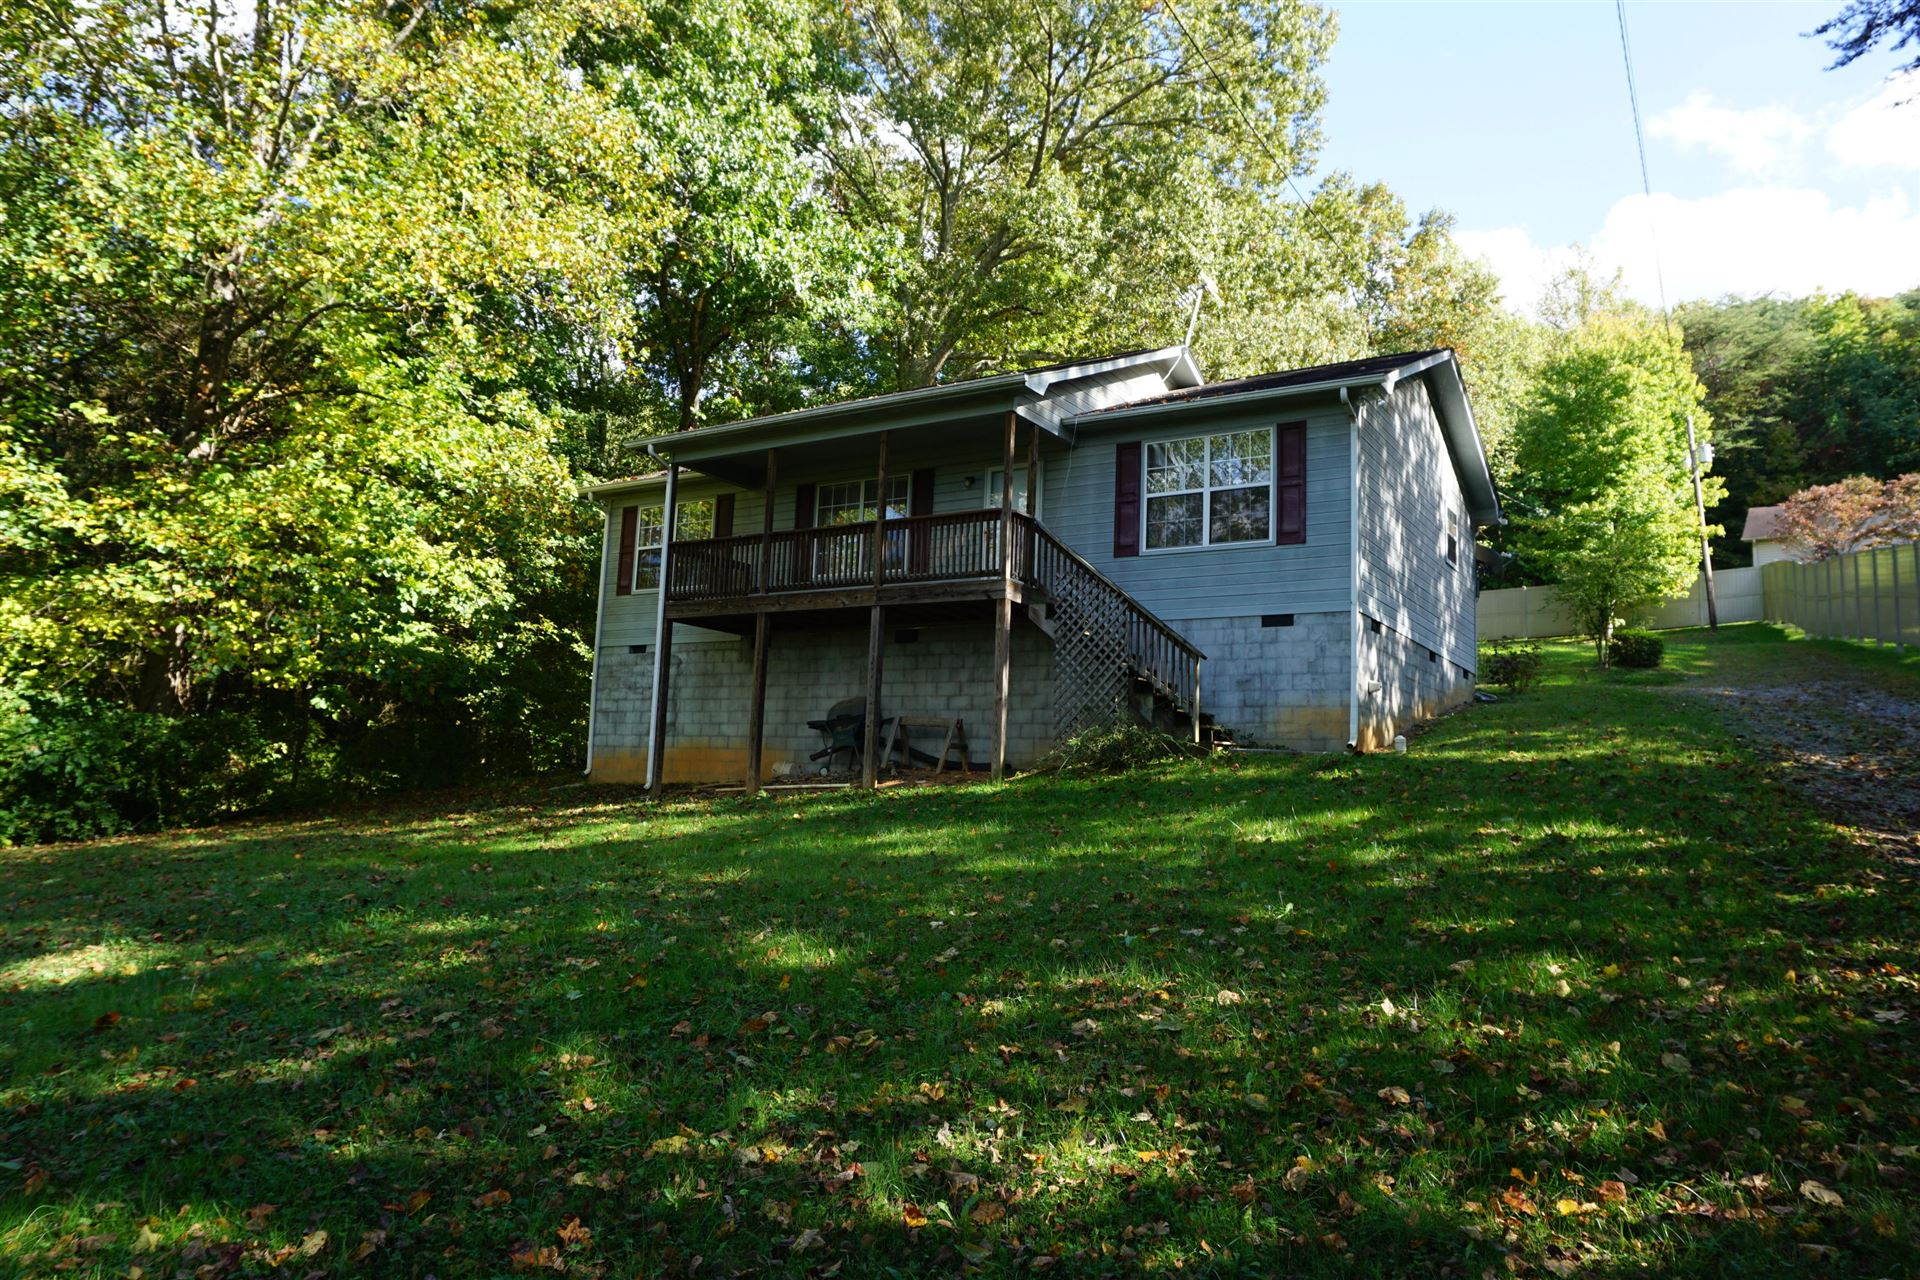 Photo of 11104 Hardin Valley Rd, Knoxville, TN 37932 (MLS # 1133408)